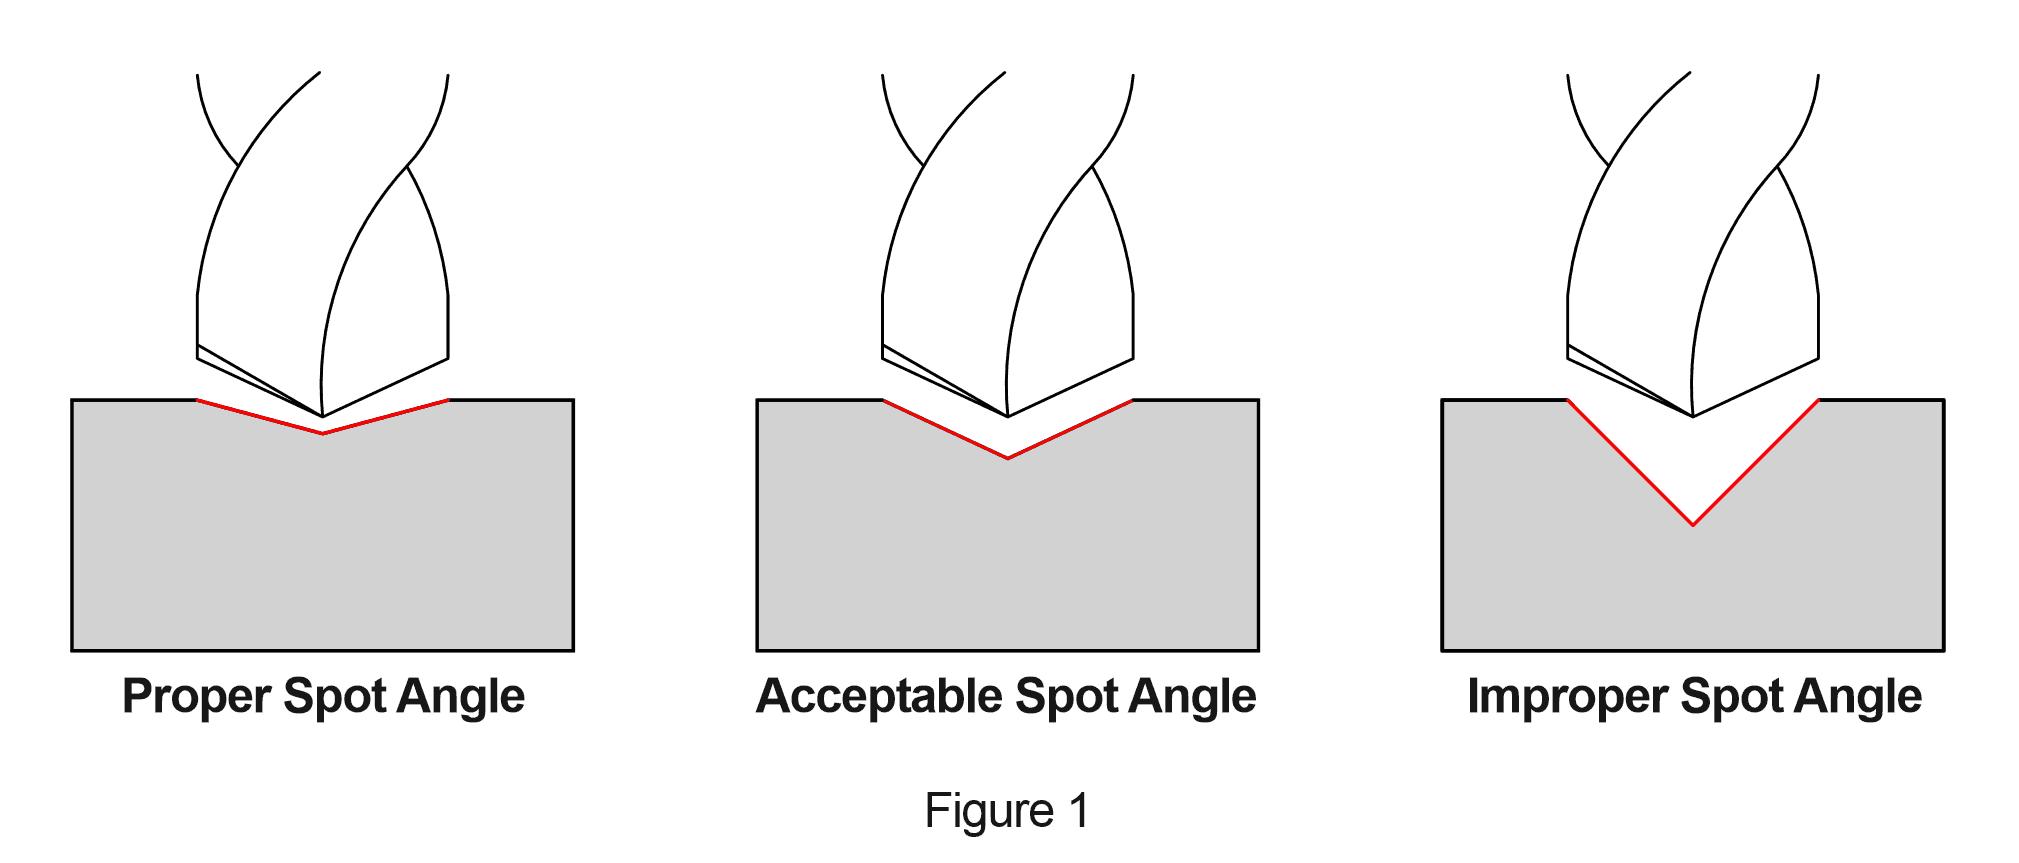 Proper Spot Angle Diagram